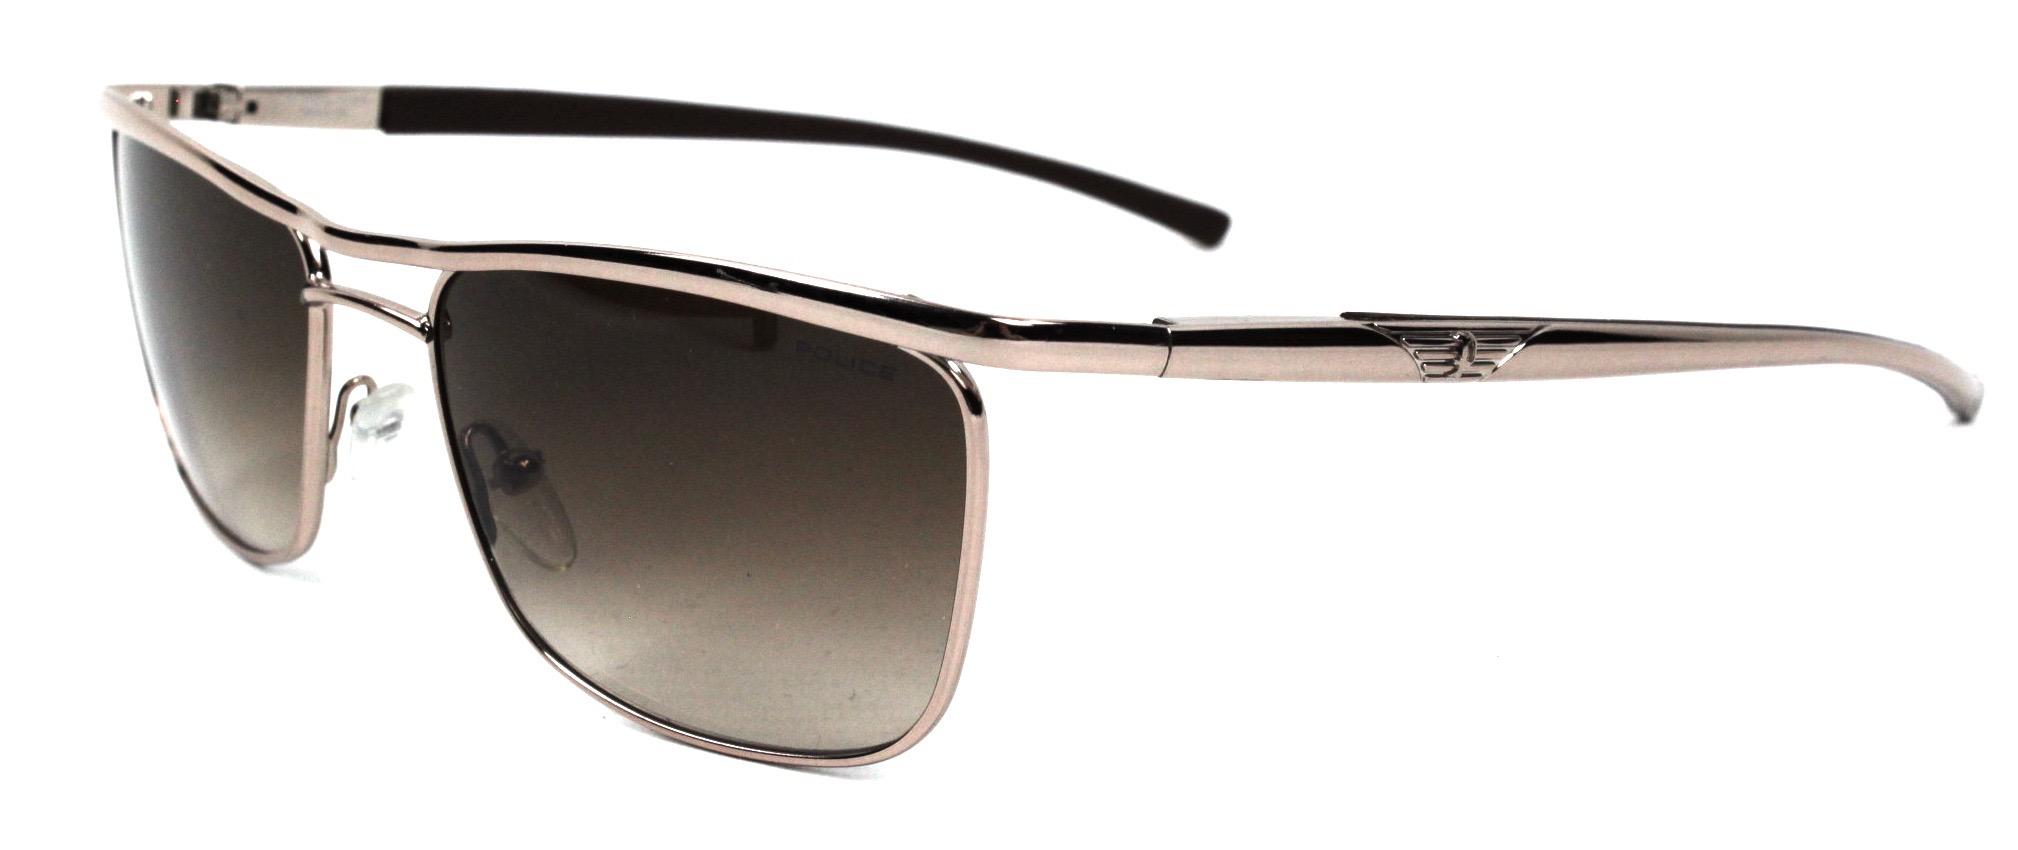 50330aacc42 Replica Police Sunglasses Uk